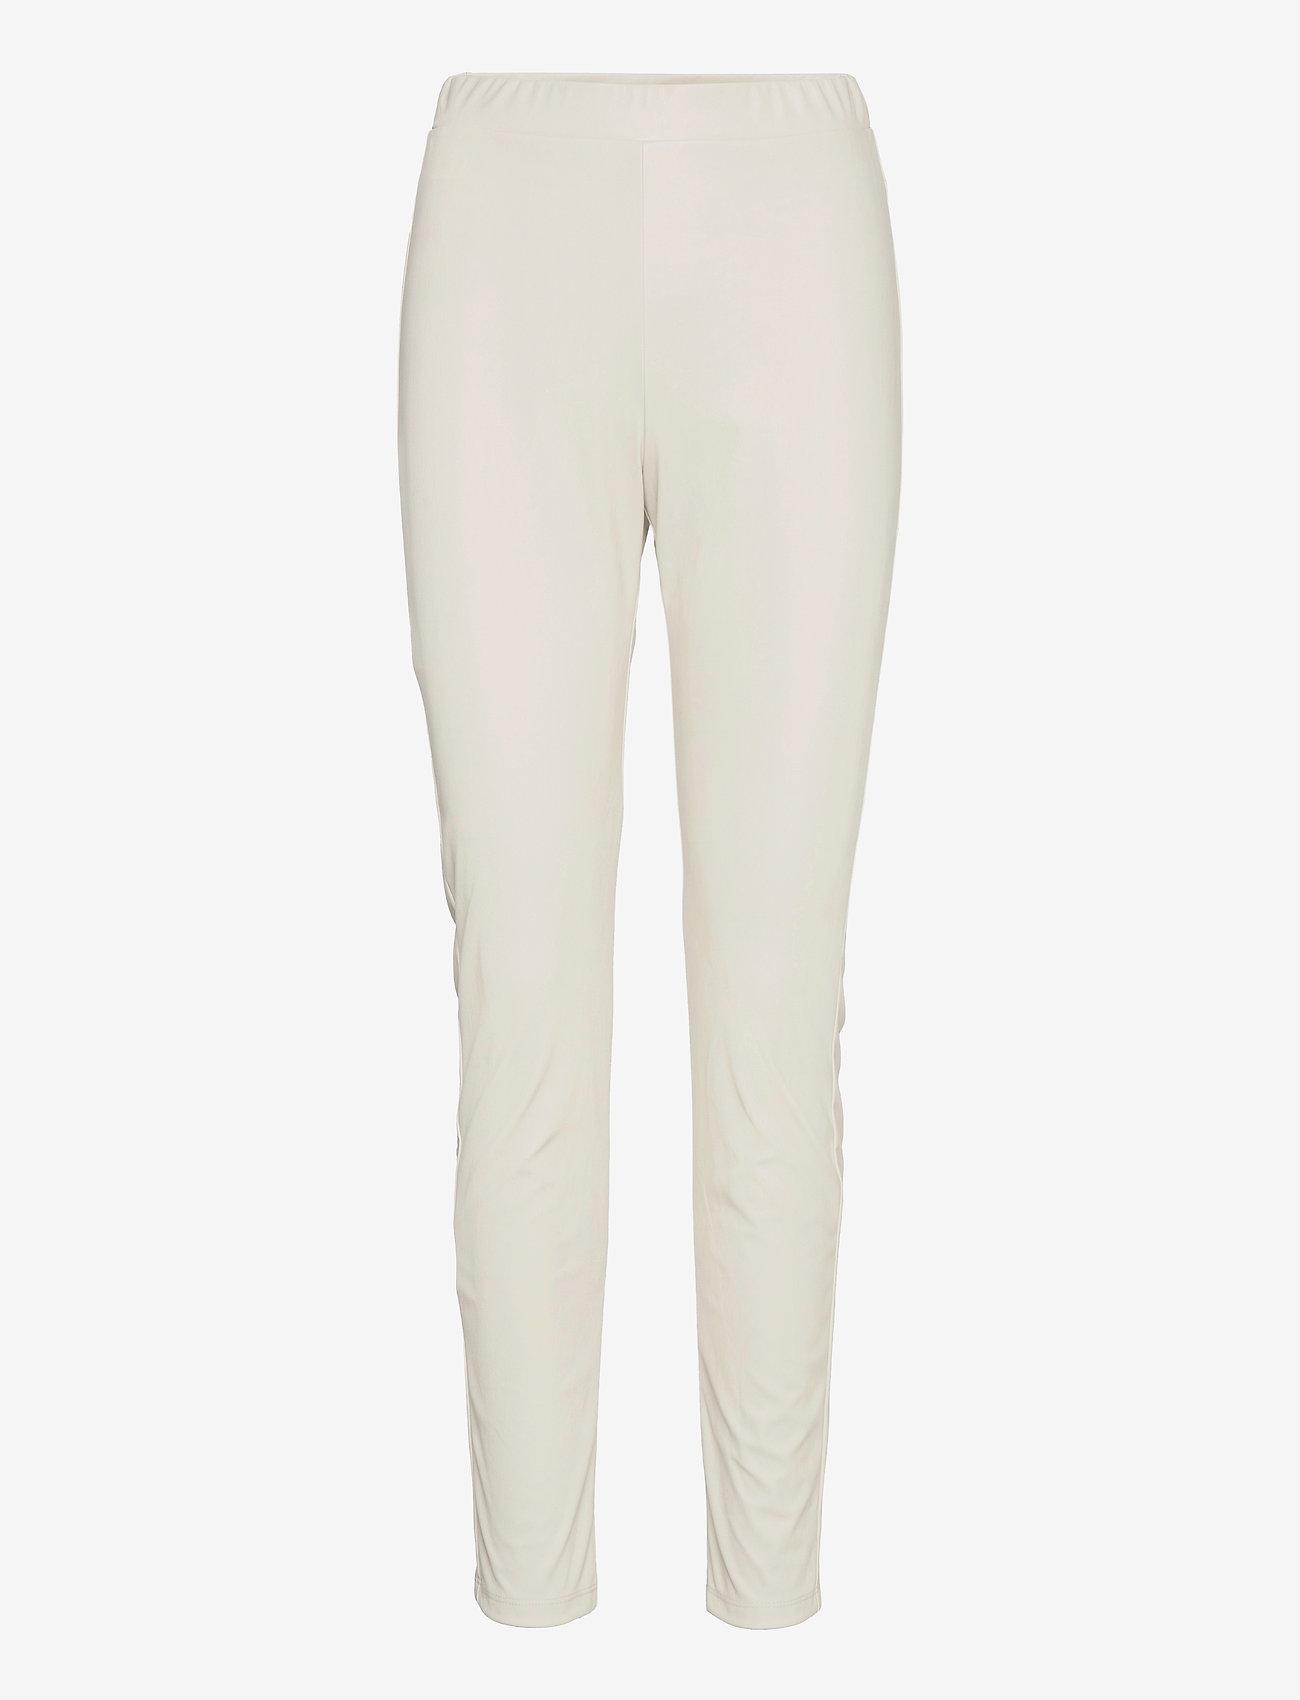 Max Mara Leisure - RANGHI - leather trousers - beige - 0